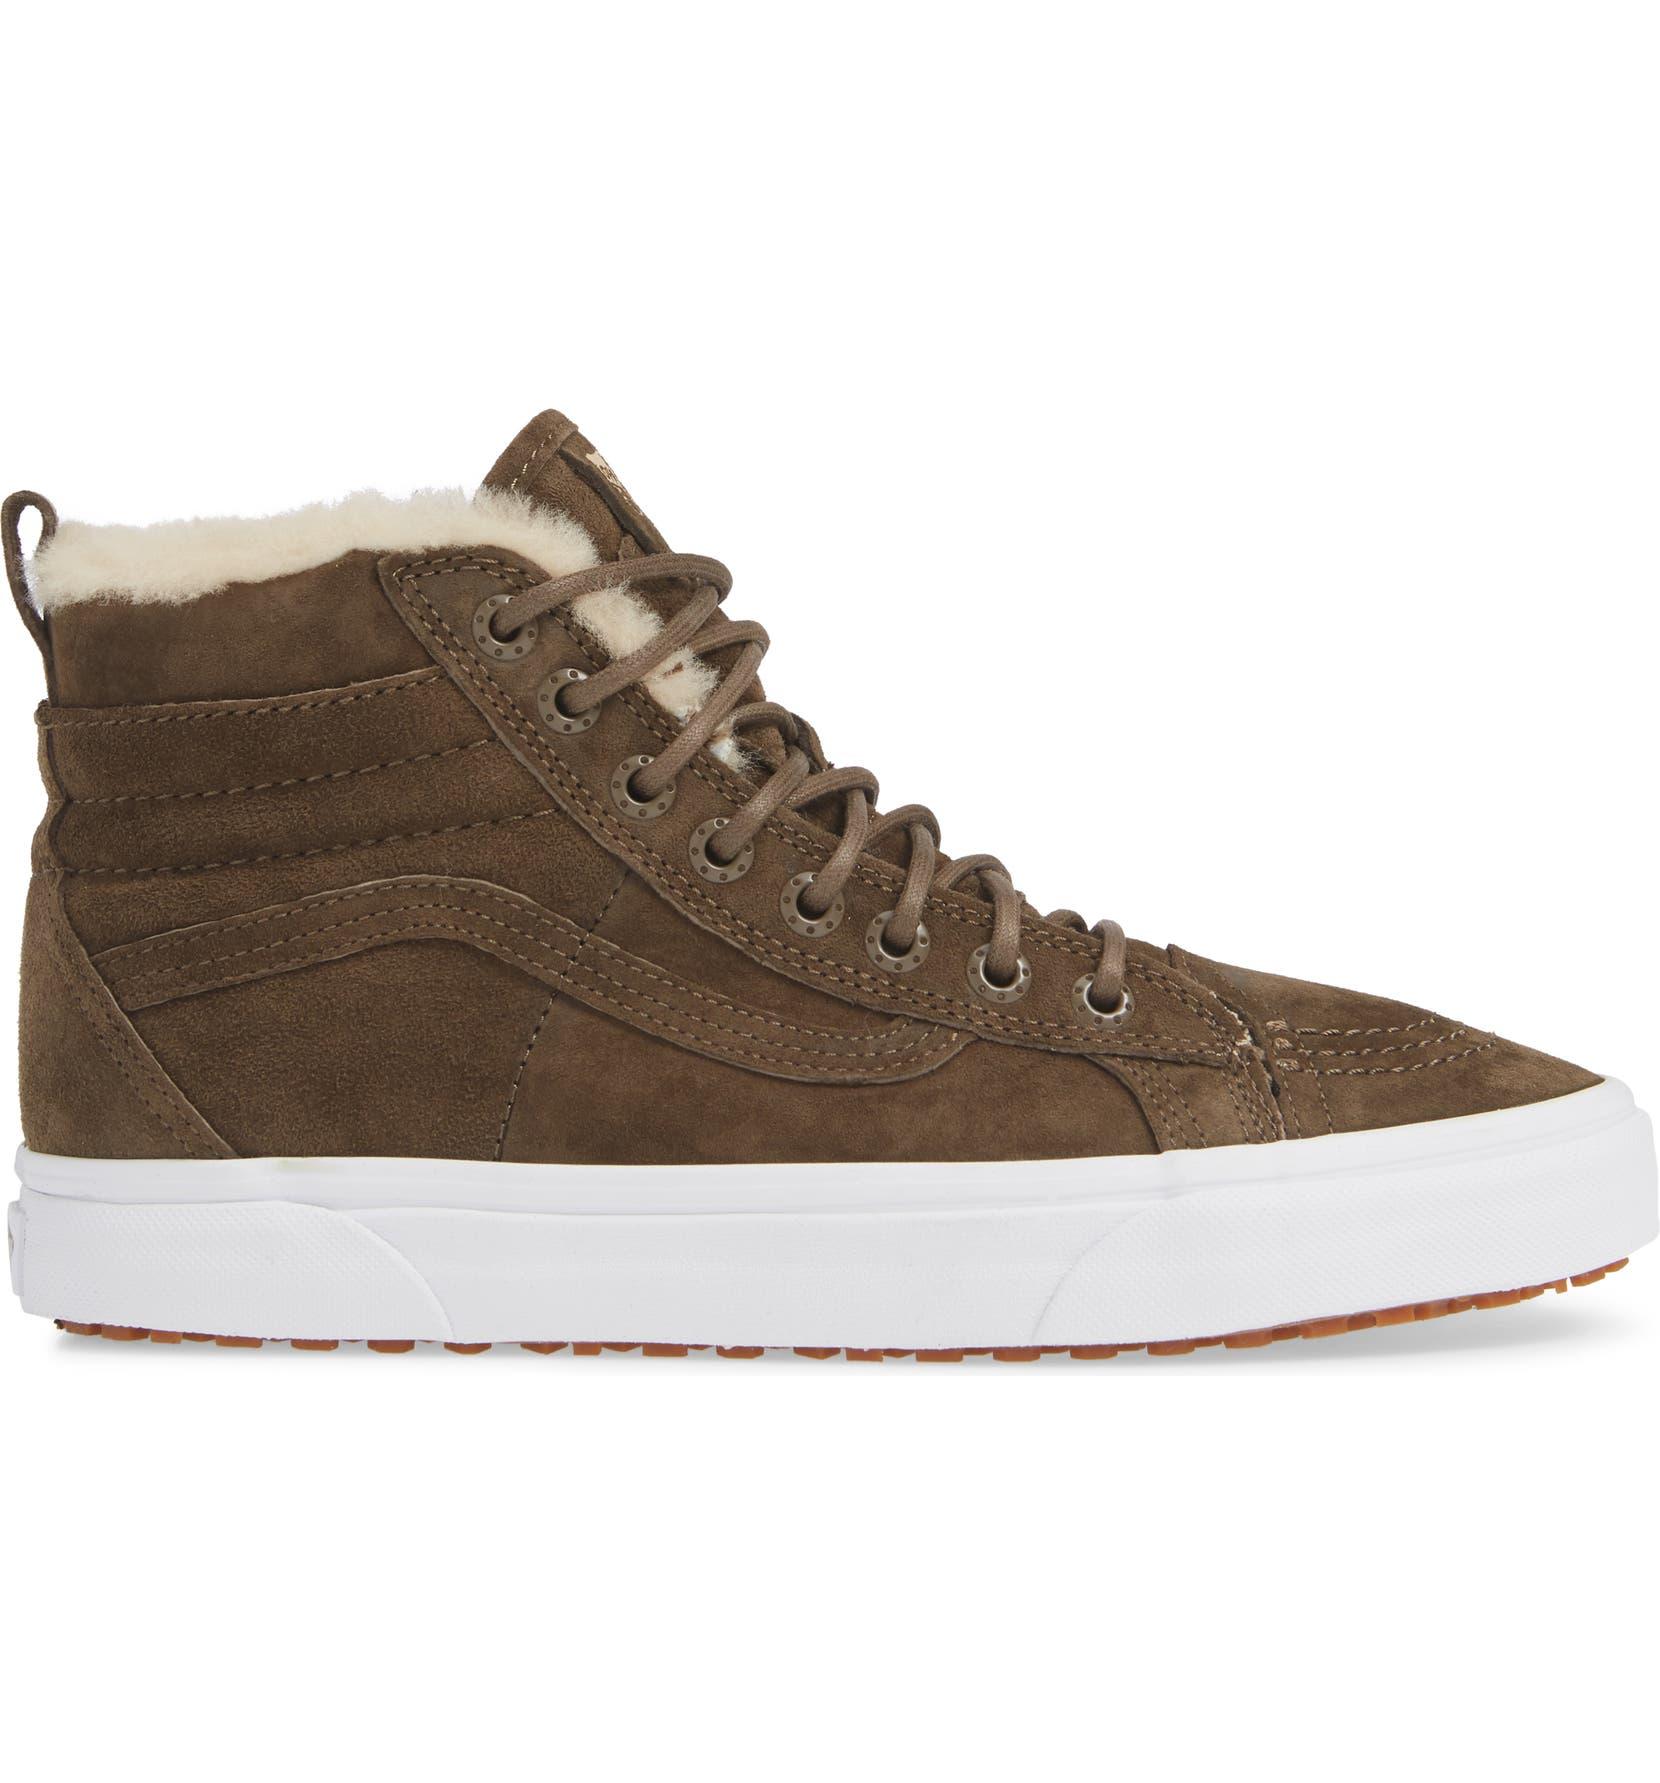 6a0ddeb2b06f Vans NYC Sk8 Hi 46 MTE DX Sneaker (Men) (Nordstrom Exclusive ...